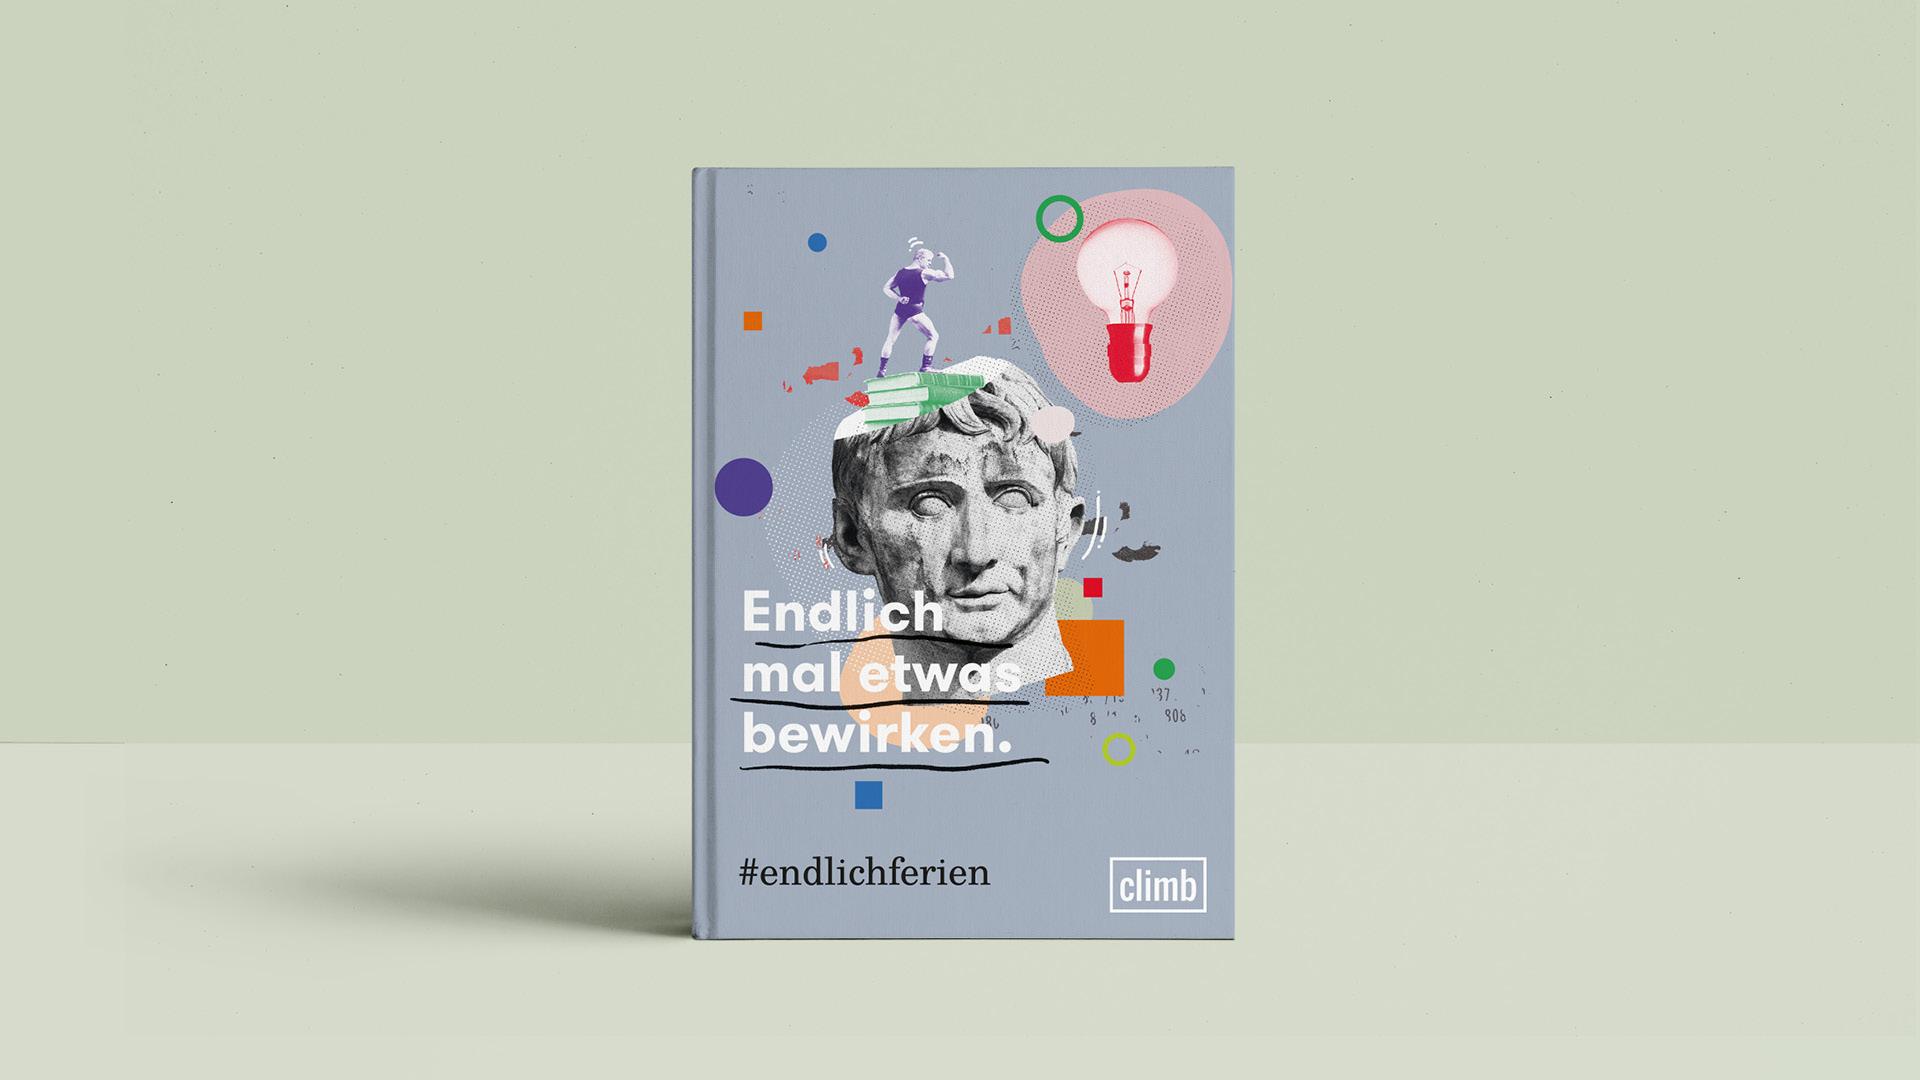 climb Lernferien Notizbuch Merchandise